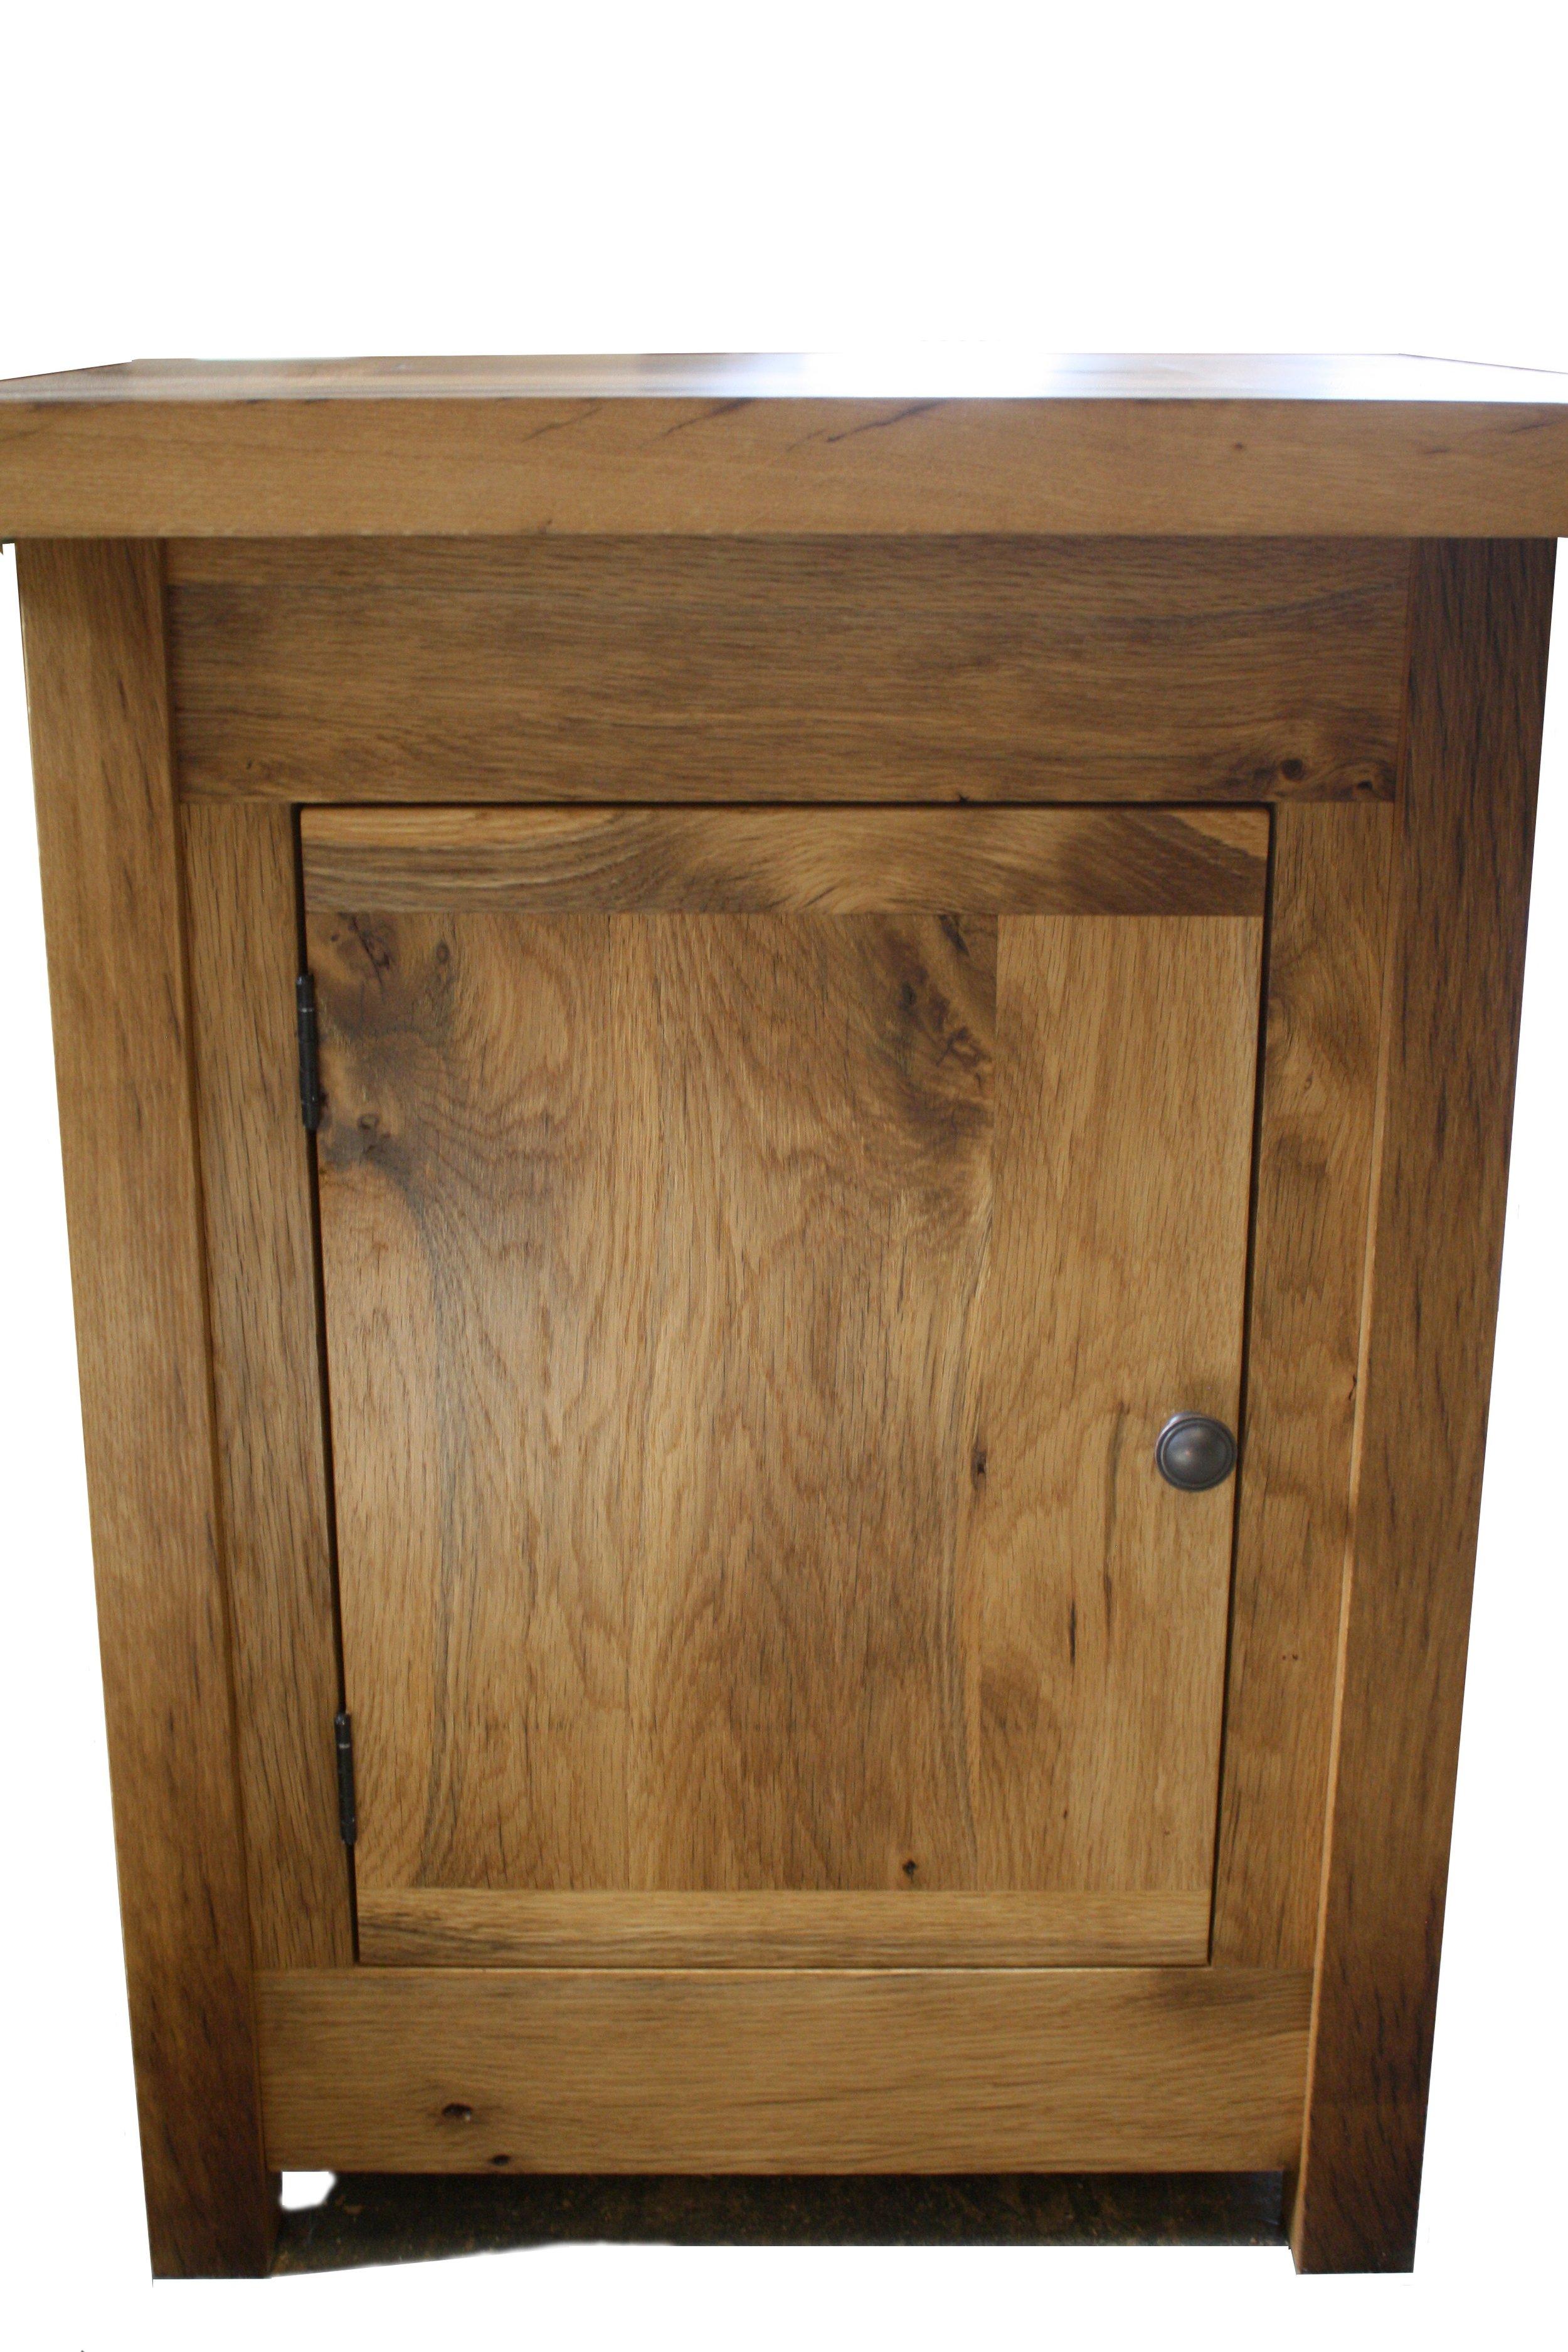 Oak end table front view.jpg